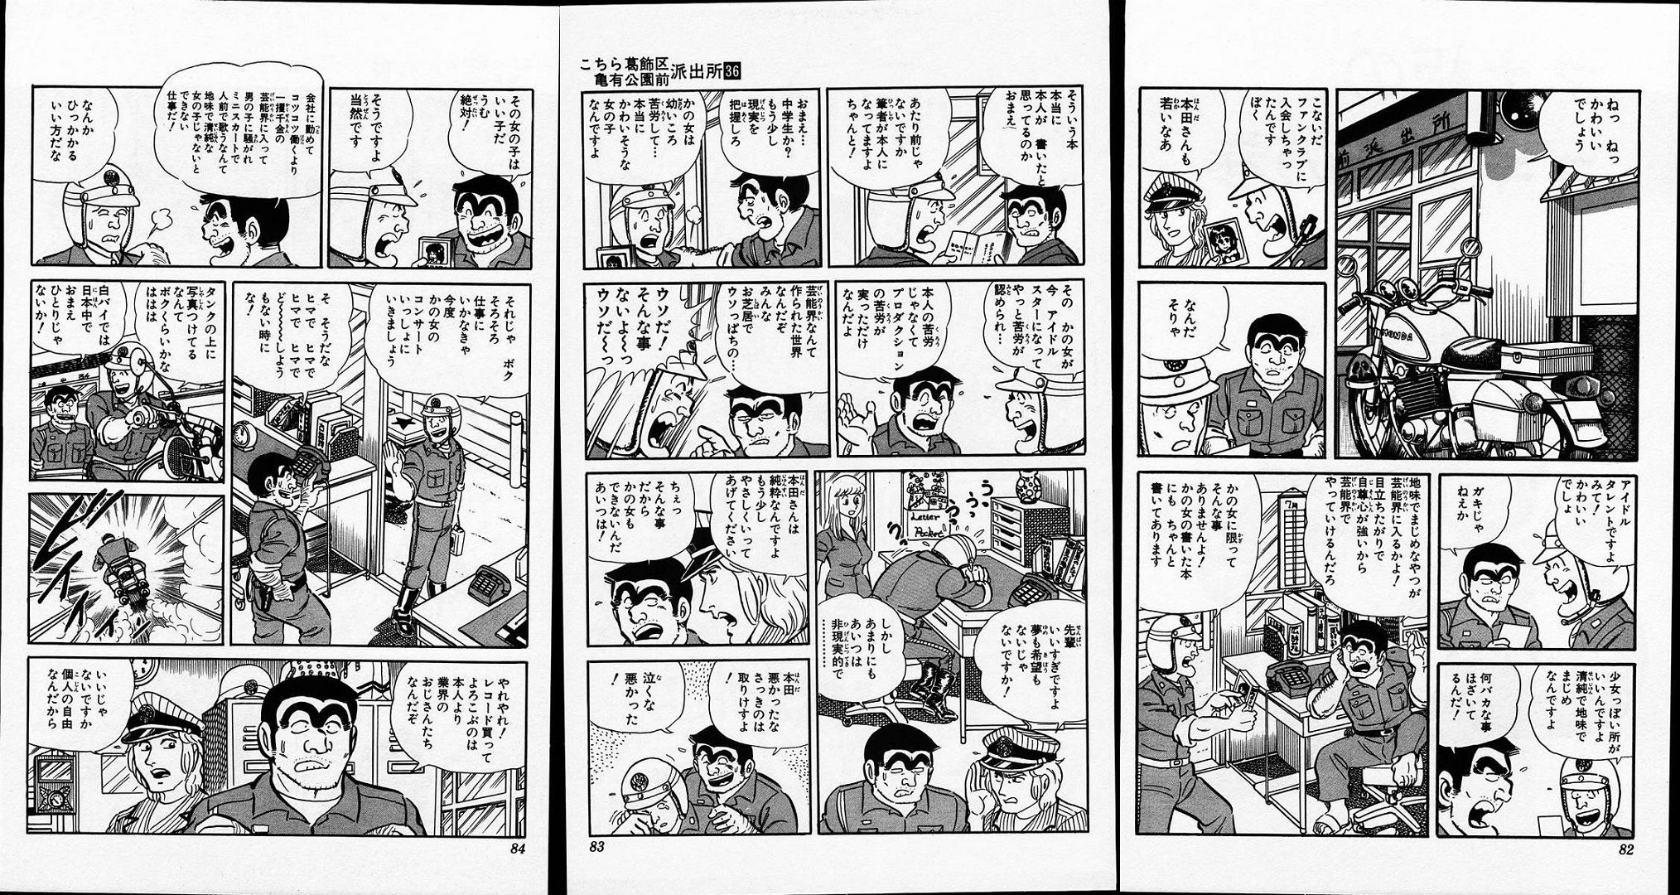 http://blog-imgs-61.fc2.com/k/y/a/kyarasokuhou/ffbg.jpg